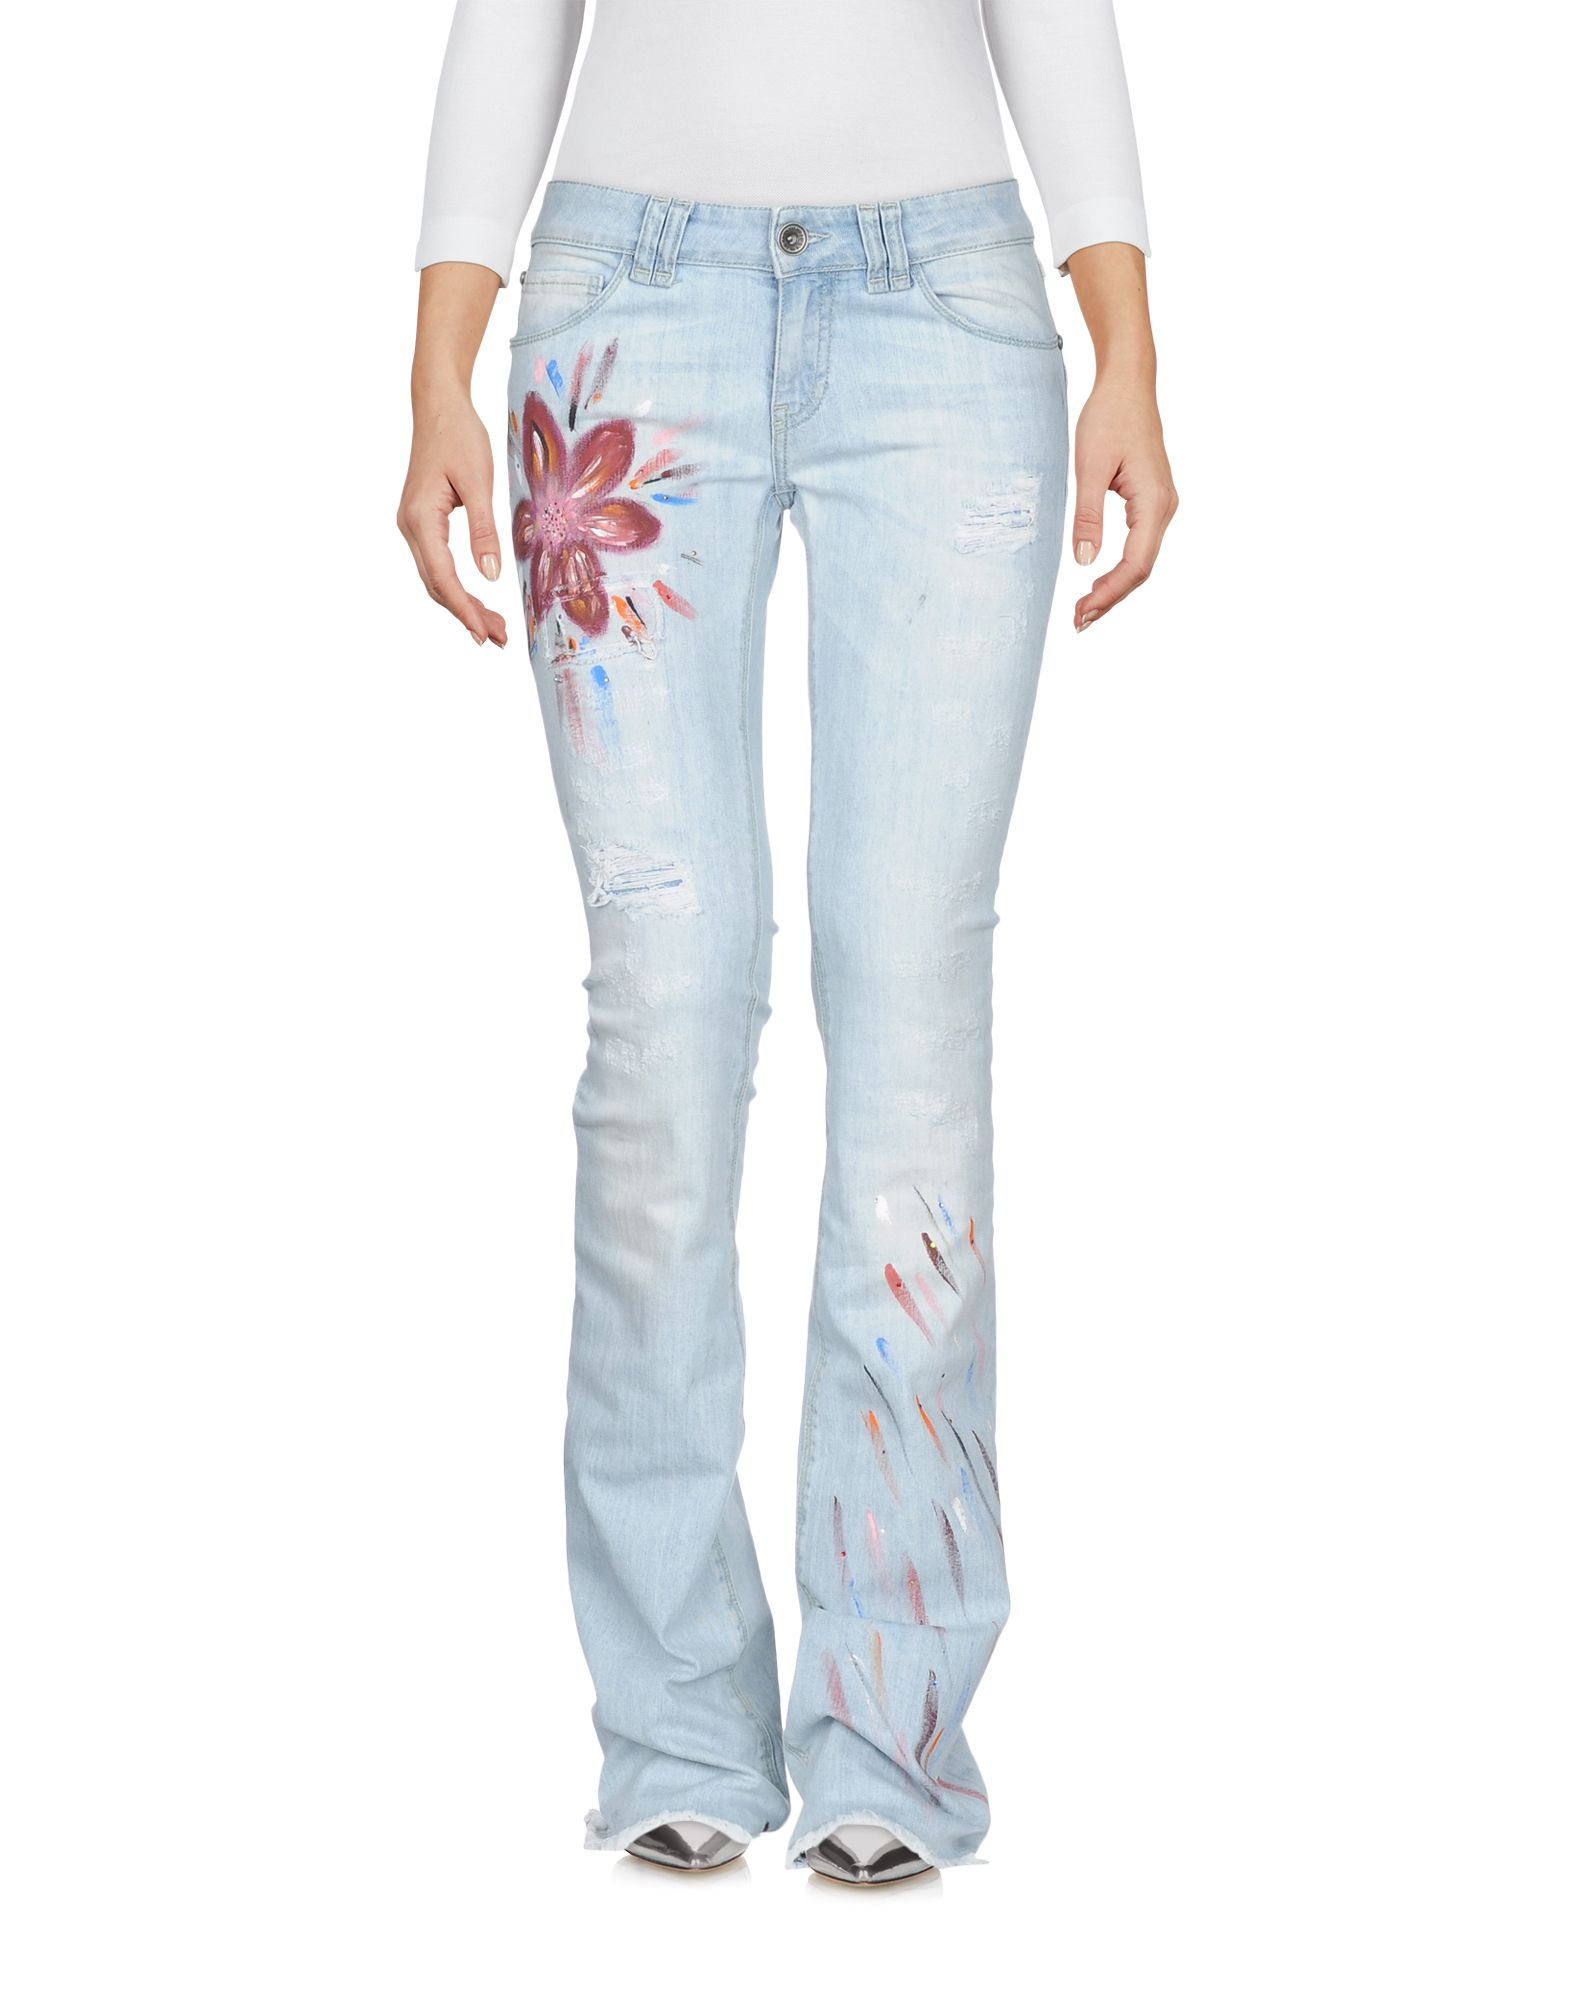 Pantaloni Jeans Plein Sud Donna - Acquista online su Ql0Gypygea